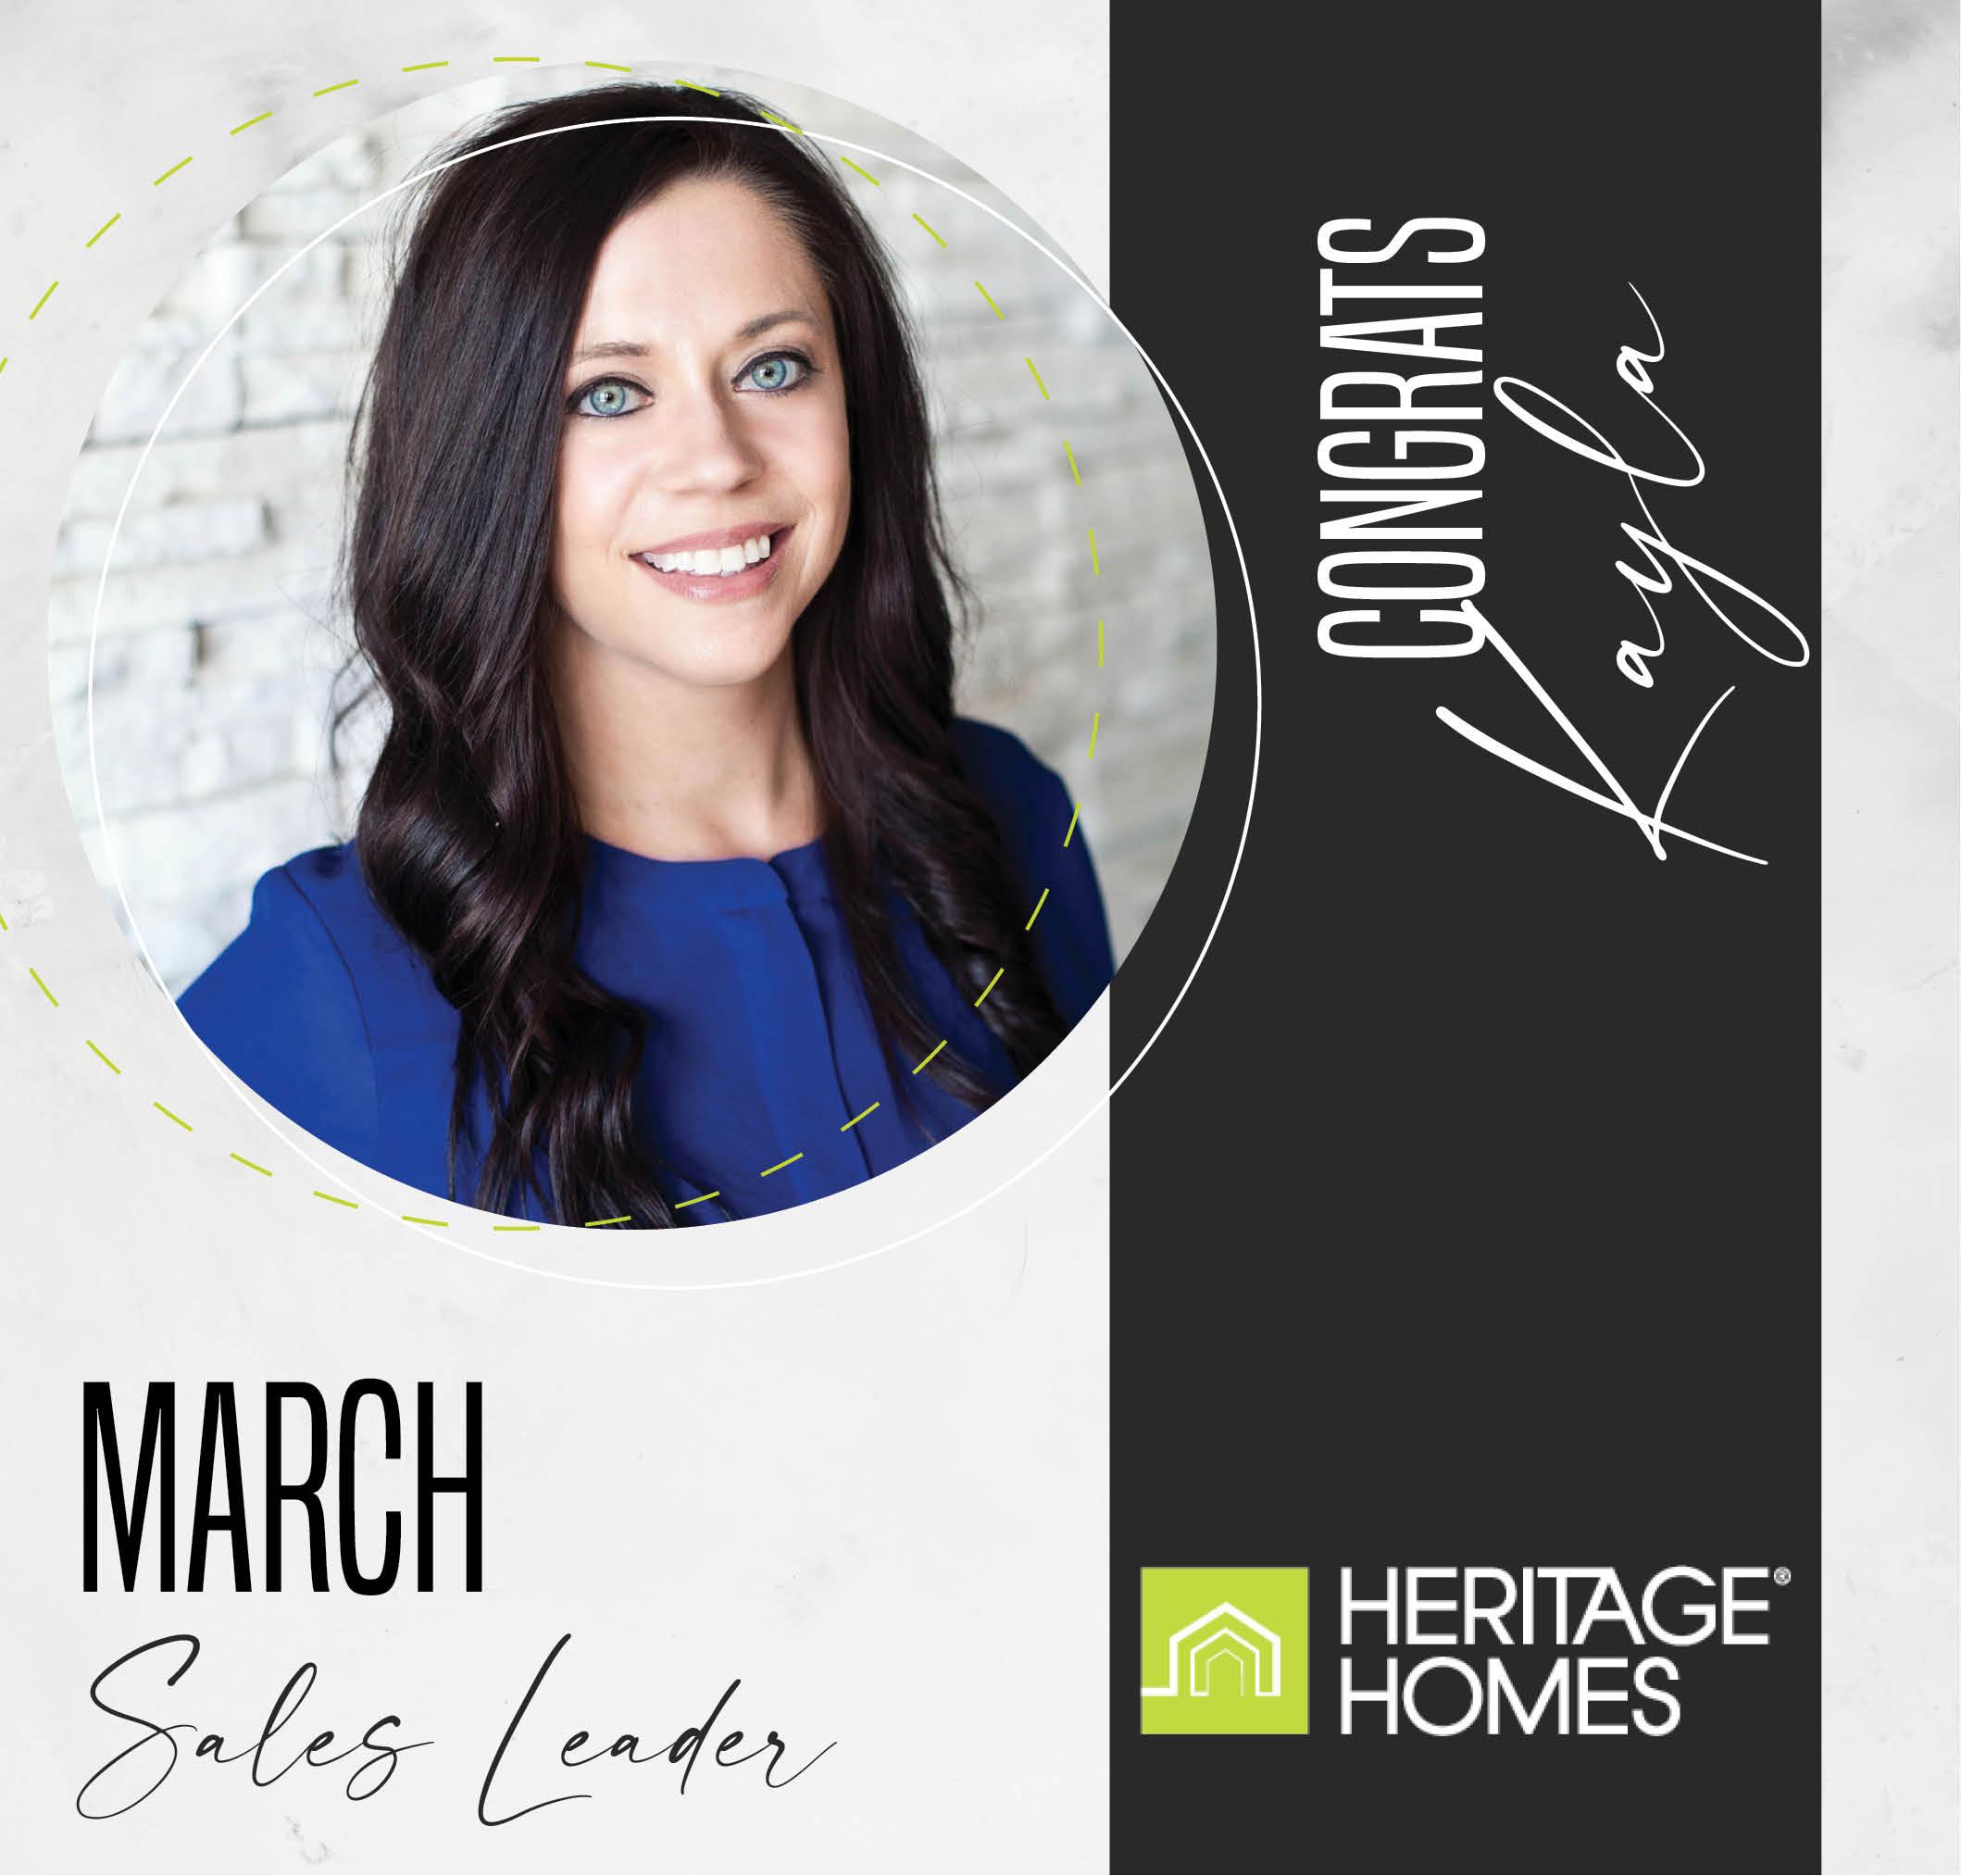 March Sales Leader – Kayla Bates